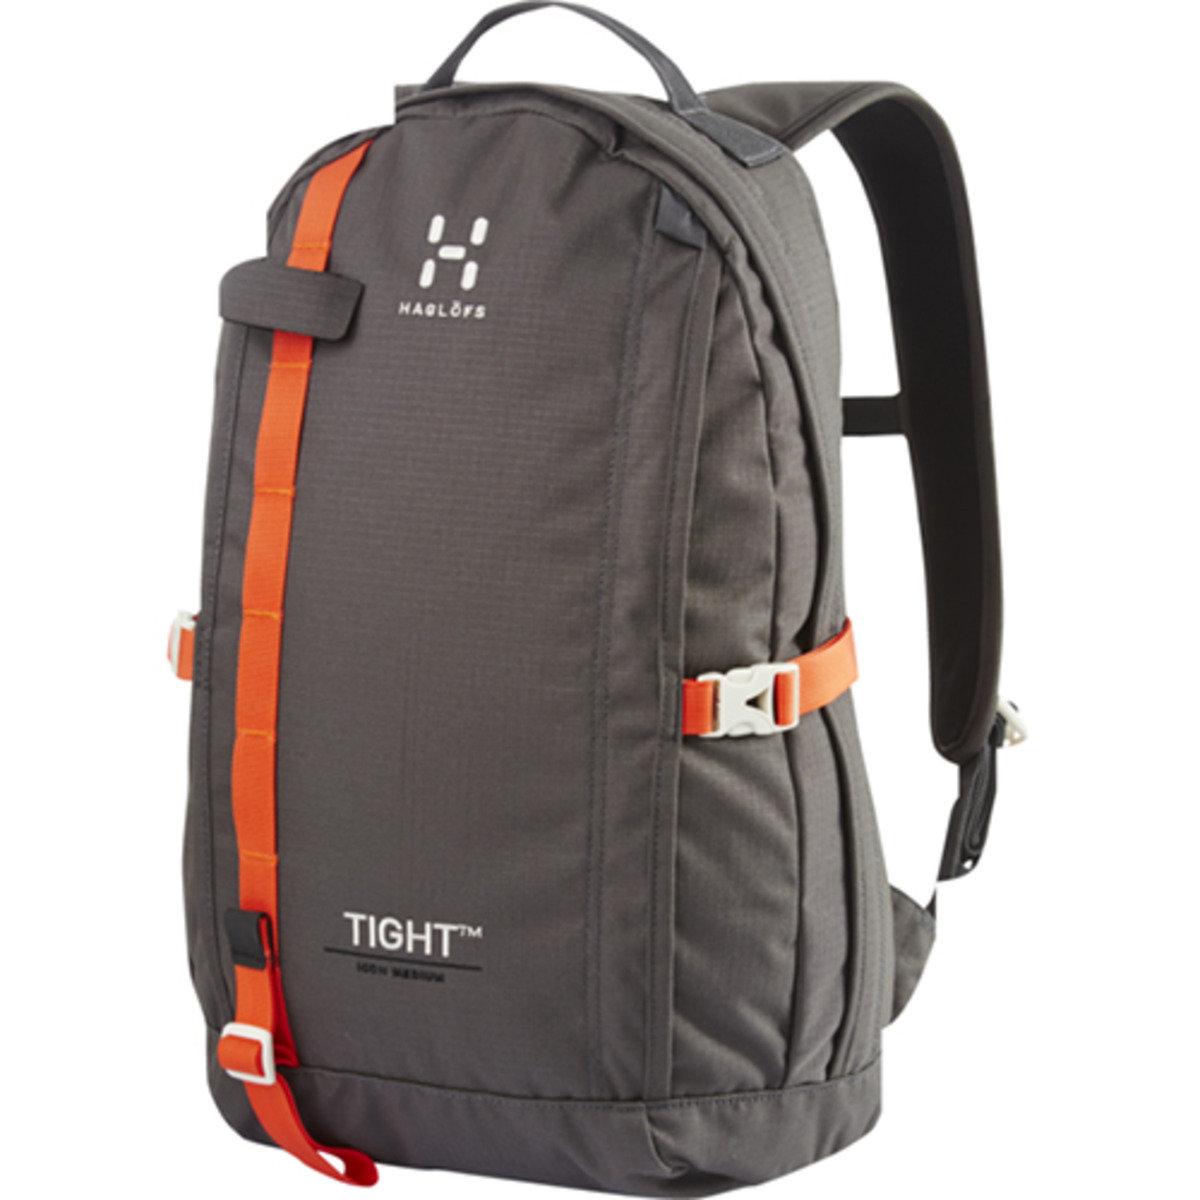 Tight Icon Medium -  時尚的輕便背包